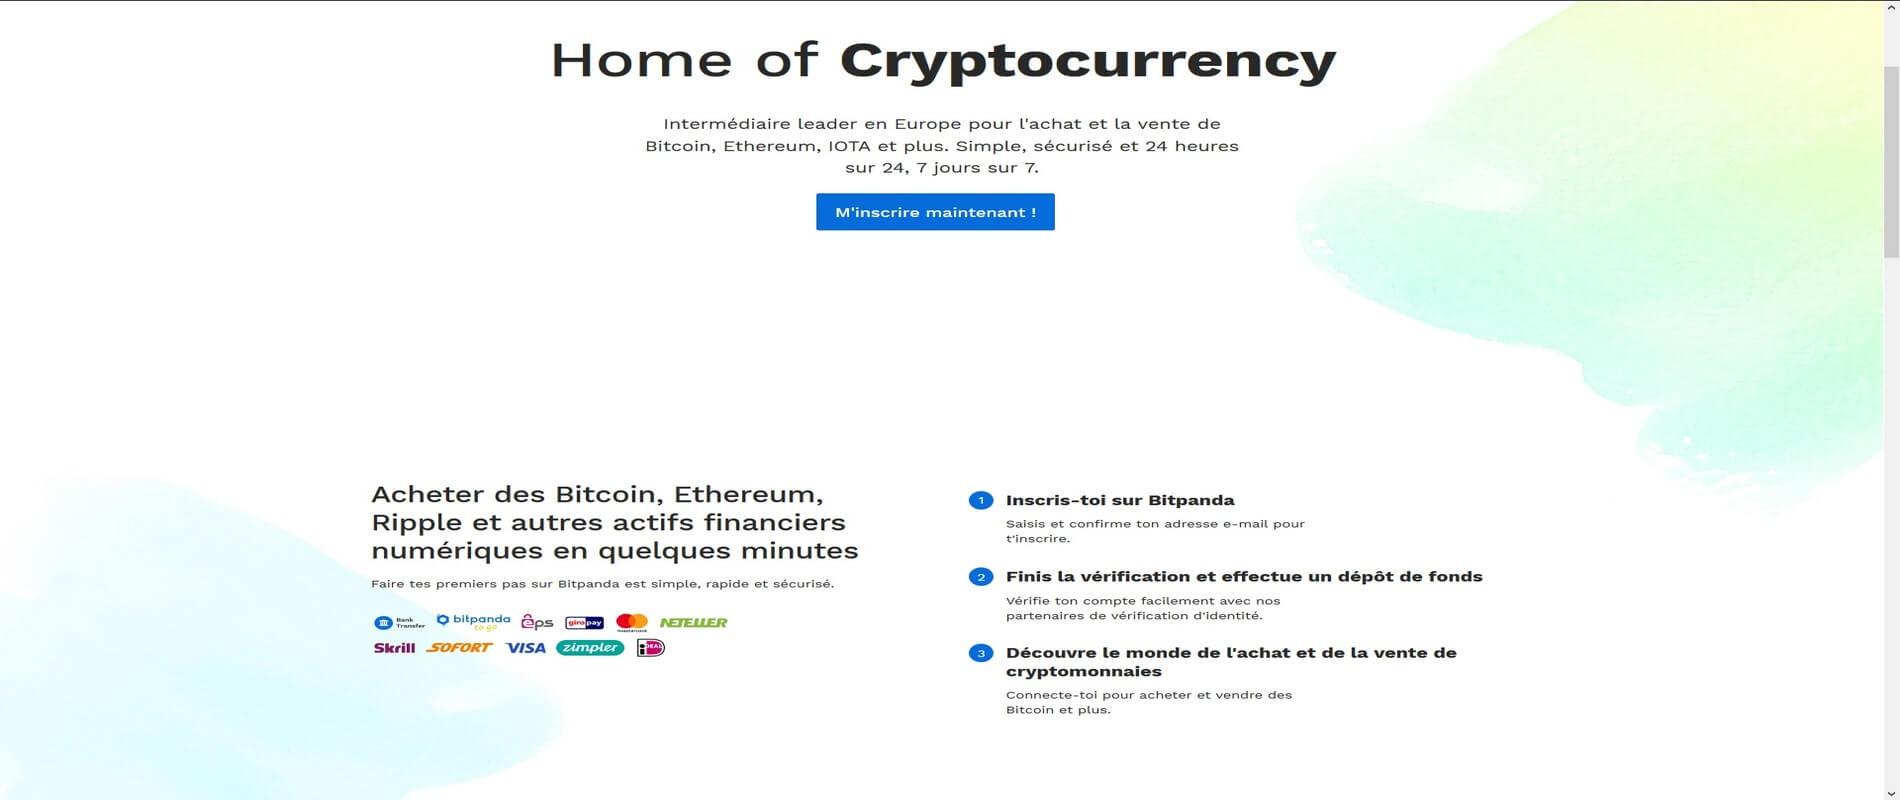 Acheter des cryptomonnaies chez Bitpanda